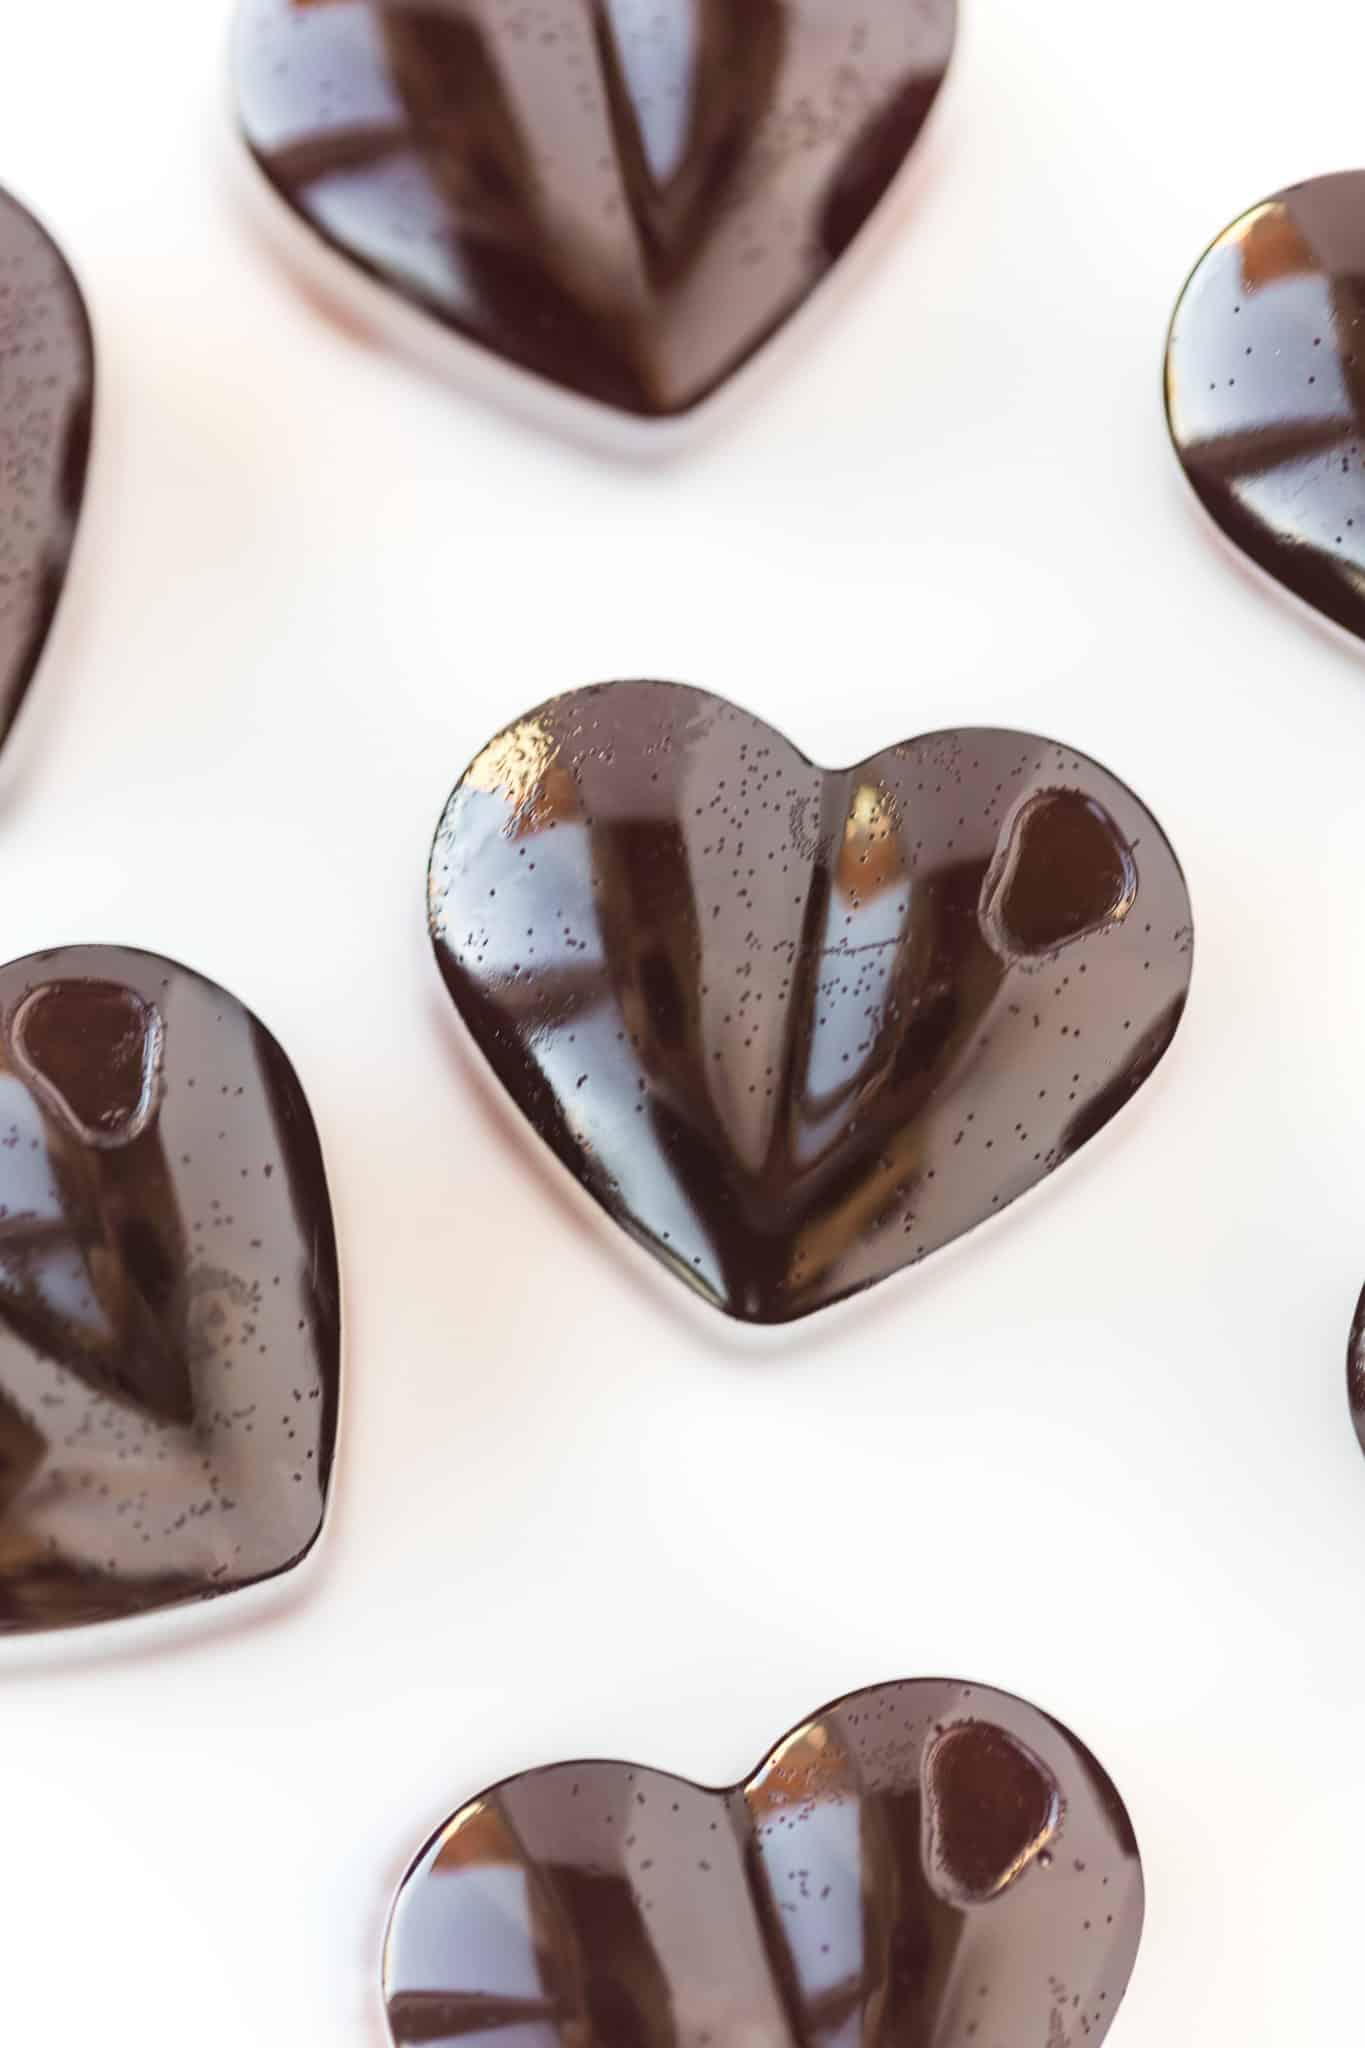 heart shaped gummy